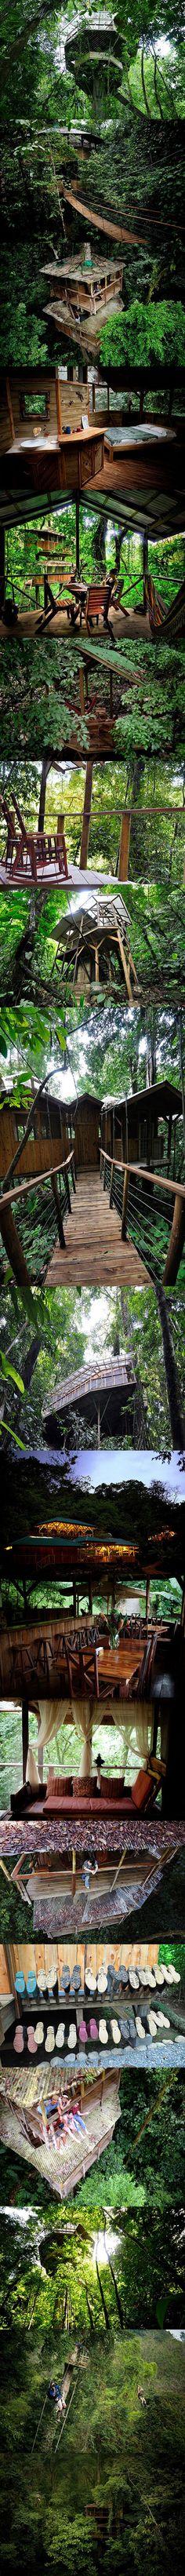 A fascinating look at Finca Bellavista, a real-life Star Wars Ewok village in Costa Rica.